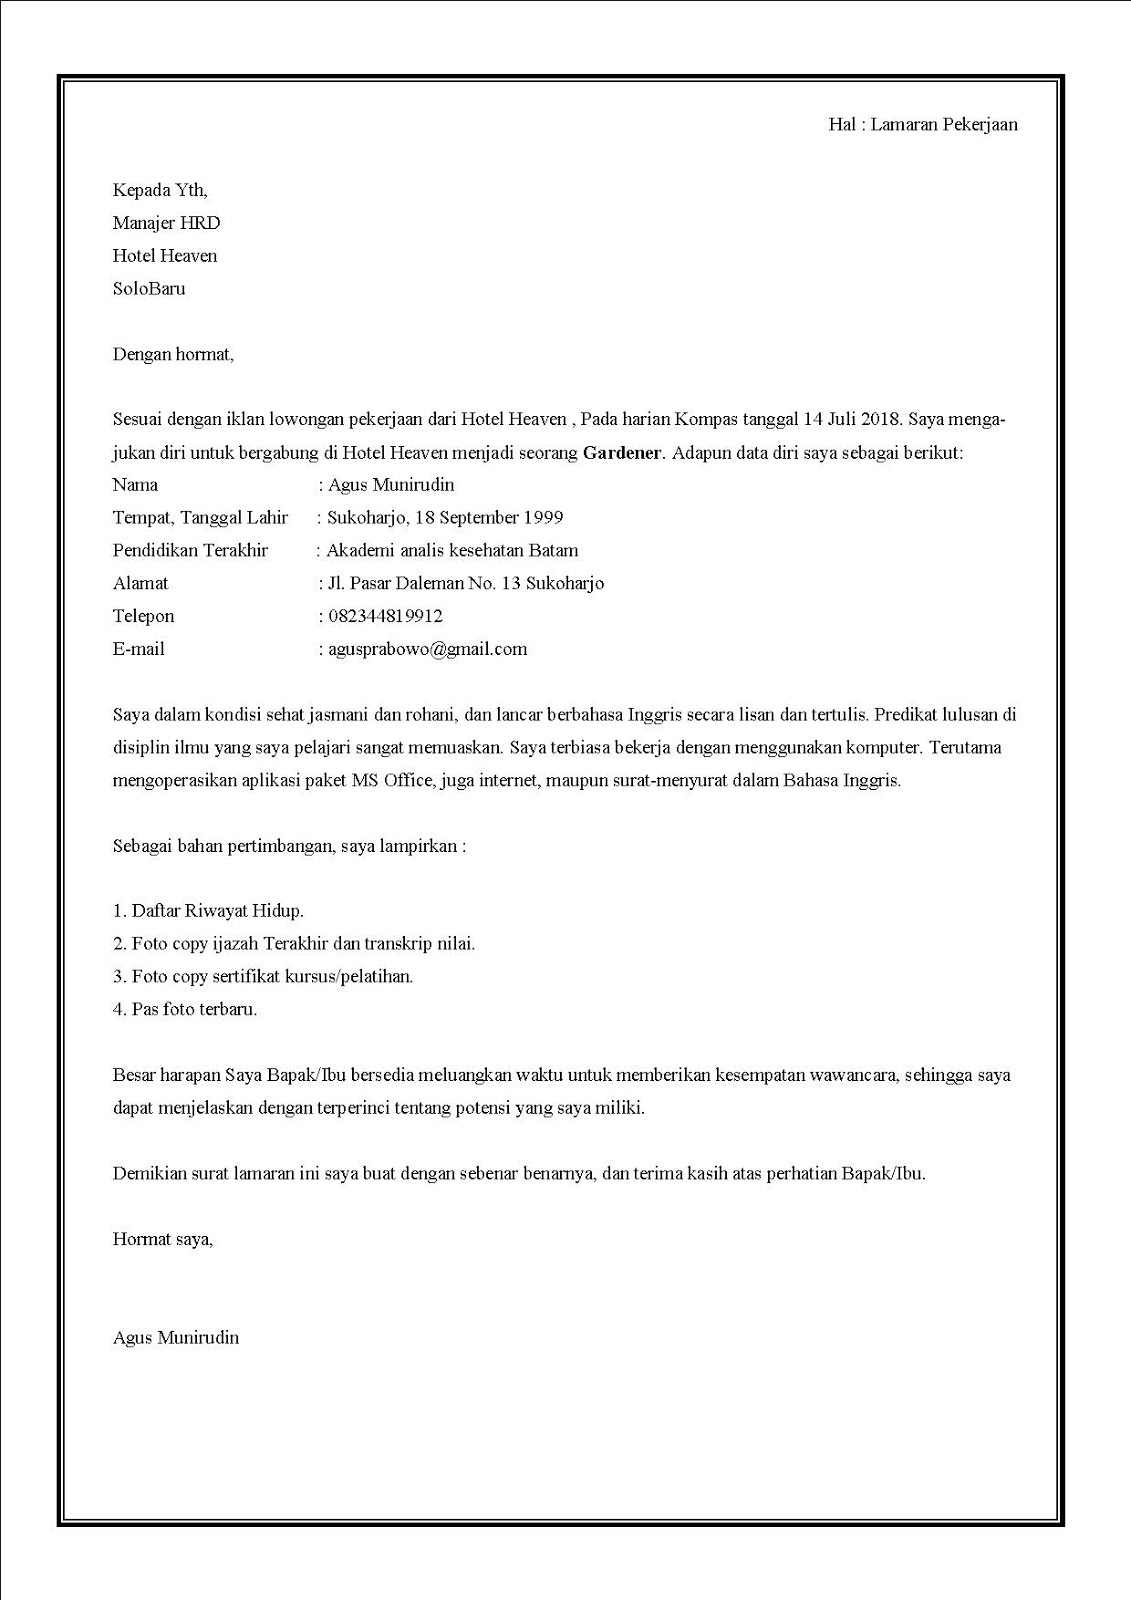 Contoh surat lamaran kerja di hotel sebagai gardener